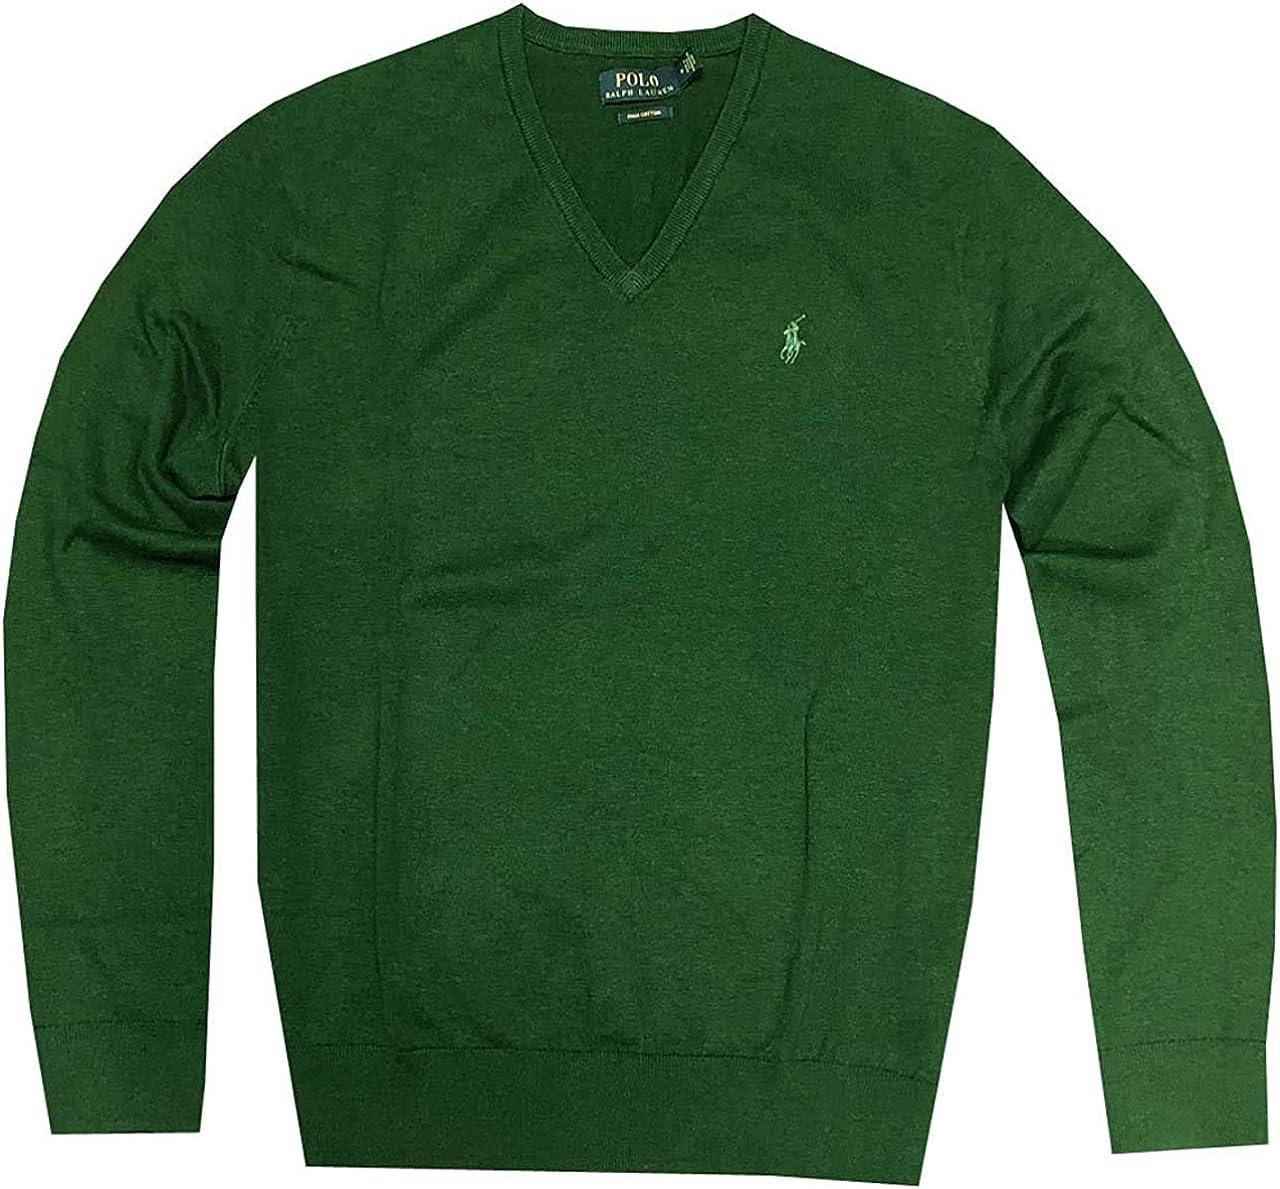 Polo Ralph Lauren Mens Big /& Tall Pima Cotton V-Neck Sweater